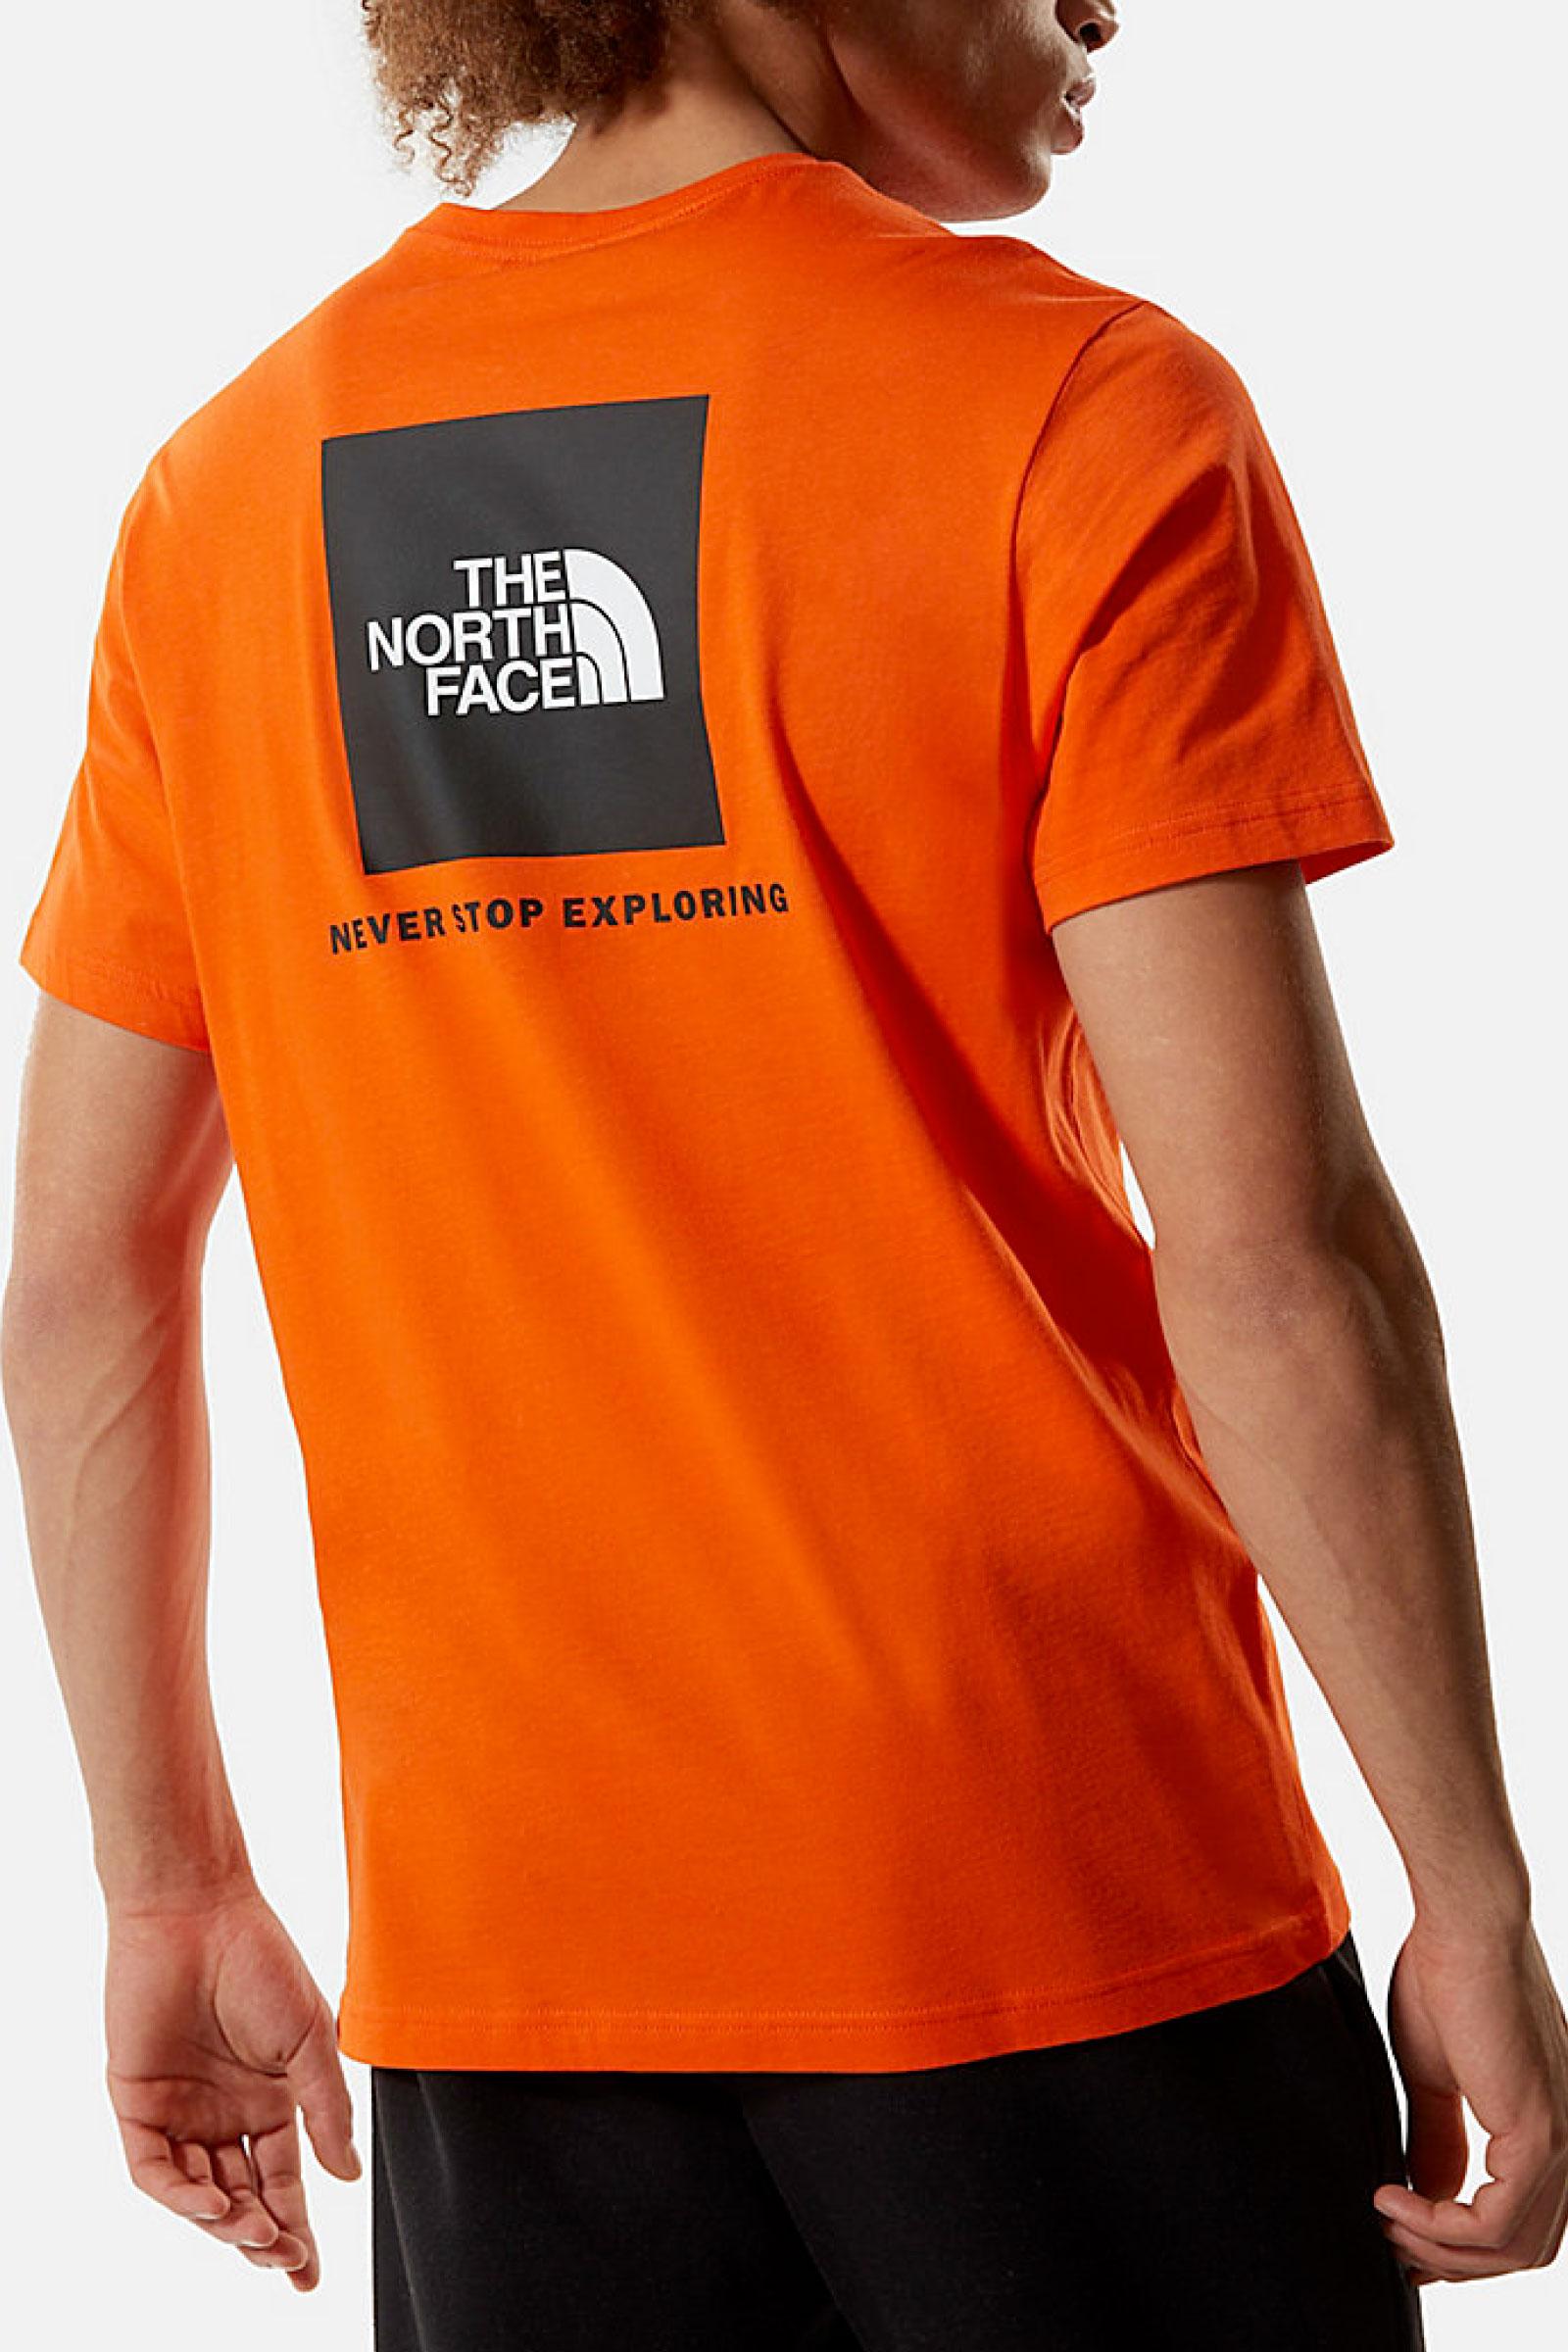 THE NORTH FACE T-Shirt Uomo THE NORTH FACE | T-Shirt | NF0A2TX2V3Q1